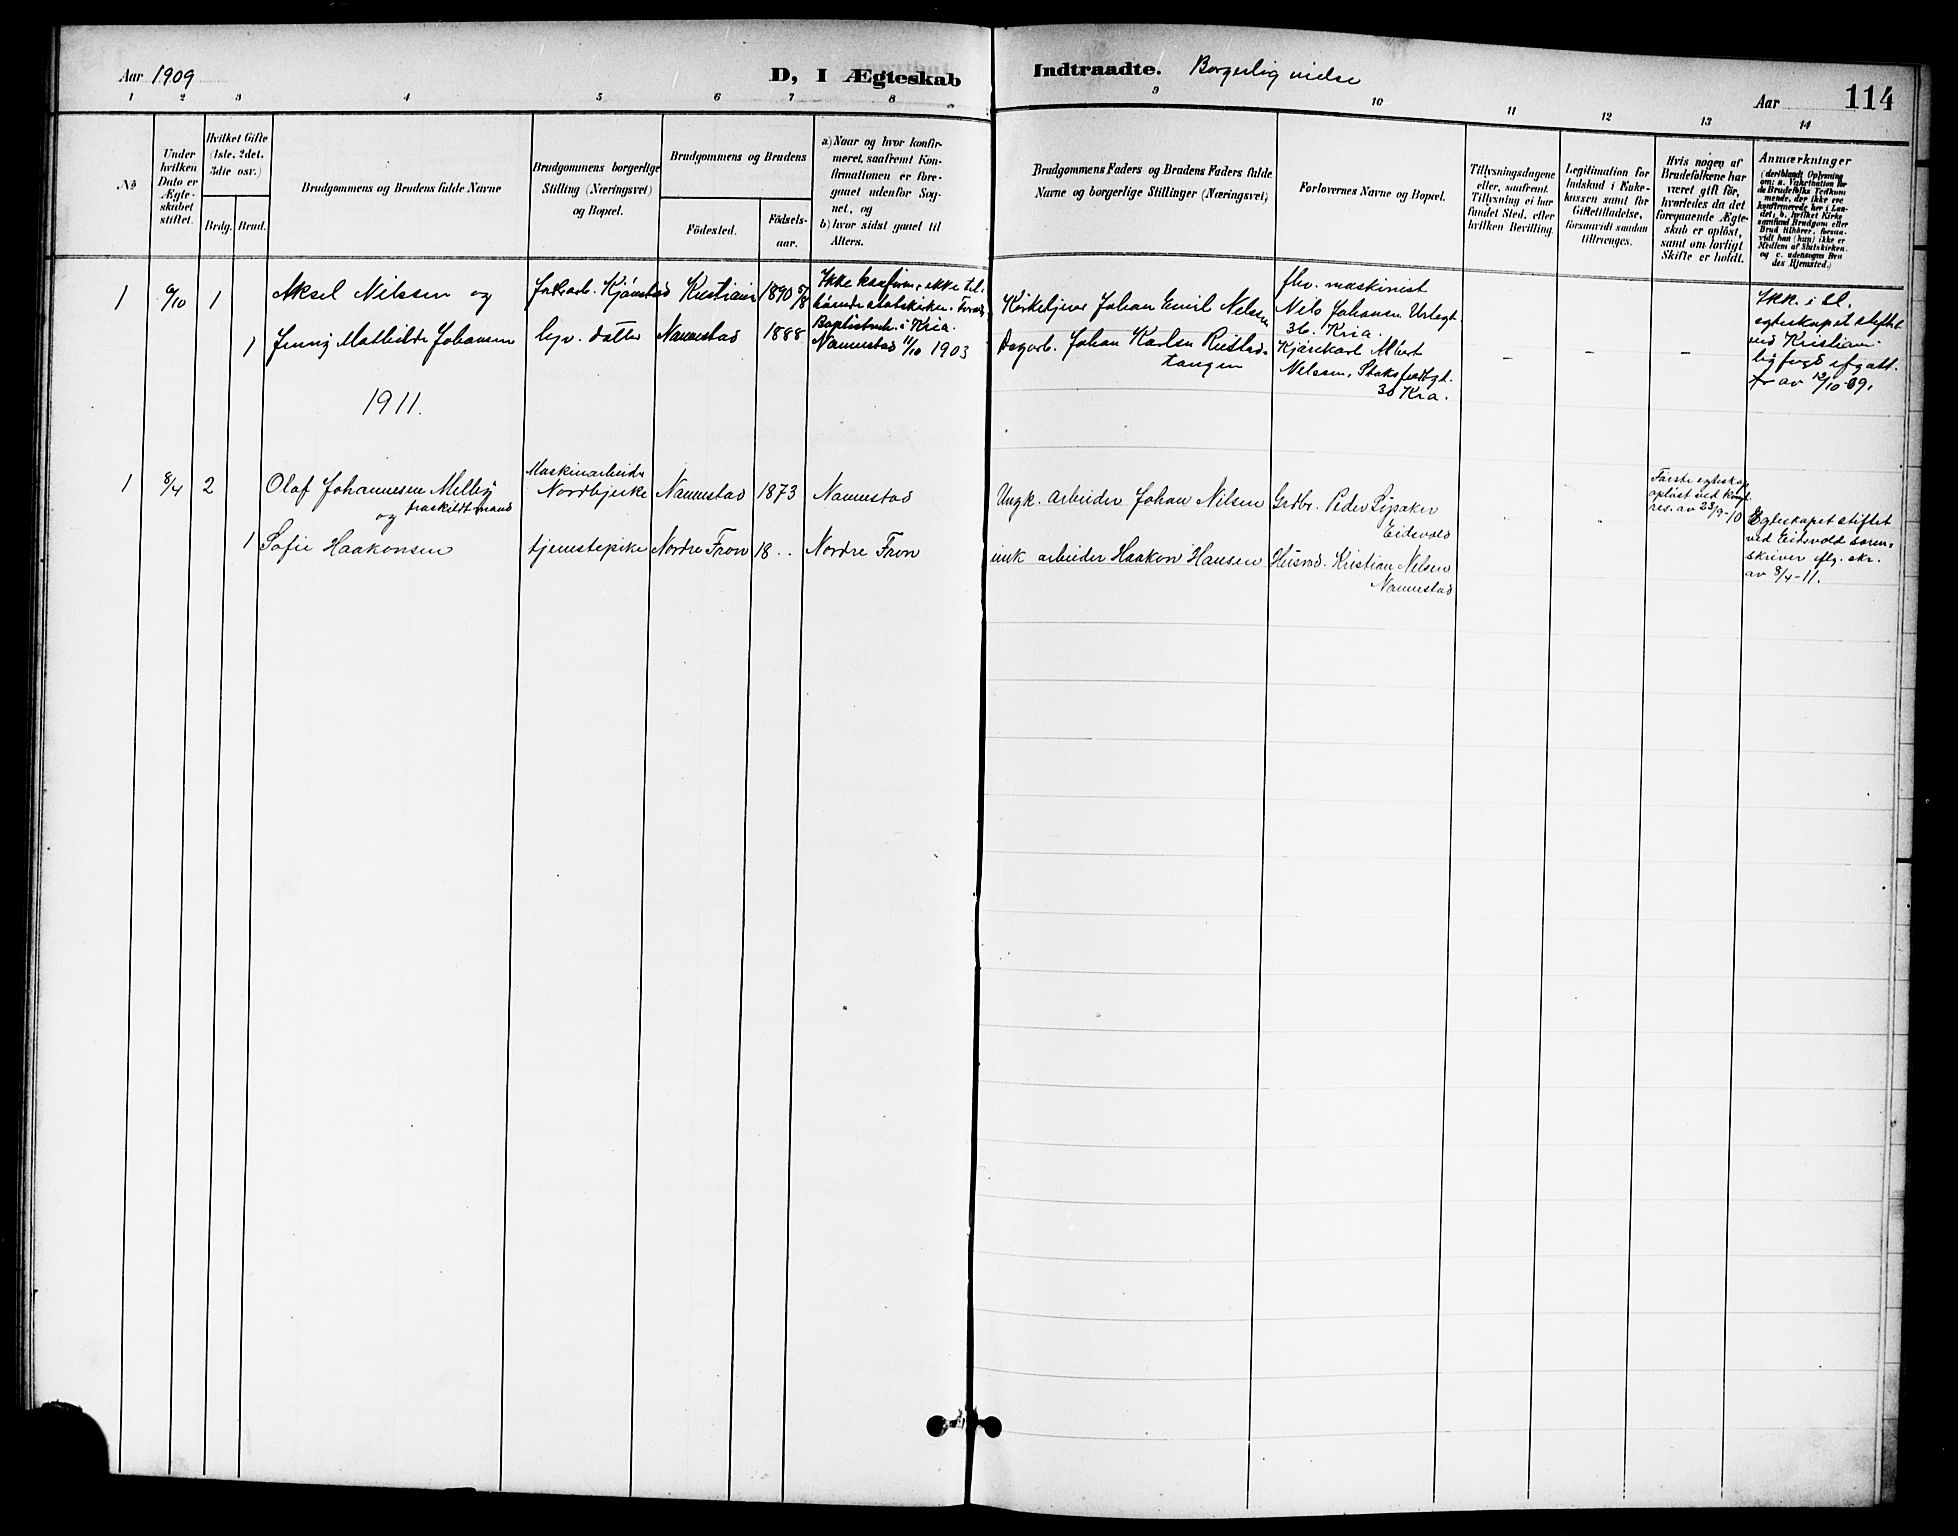 SAO, Nannestad prestekontor Kirkebøker, G/Ga/L0002: Klokkerbok nr. I 2, 1901-1913, s. 114